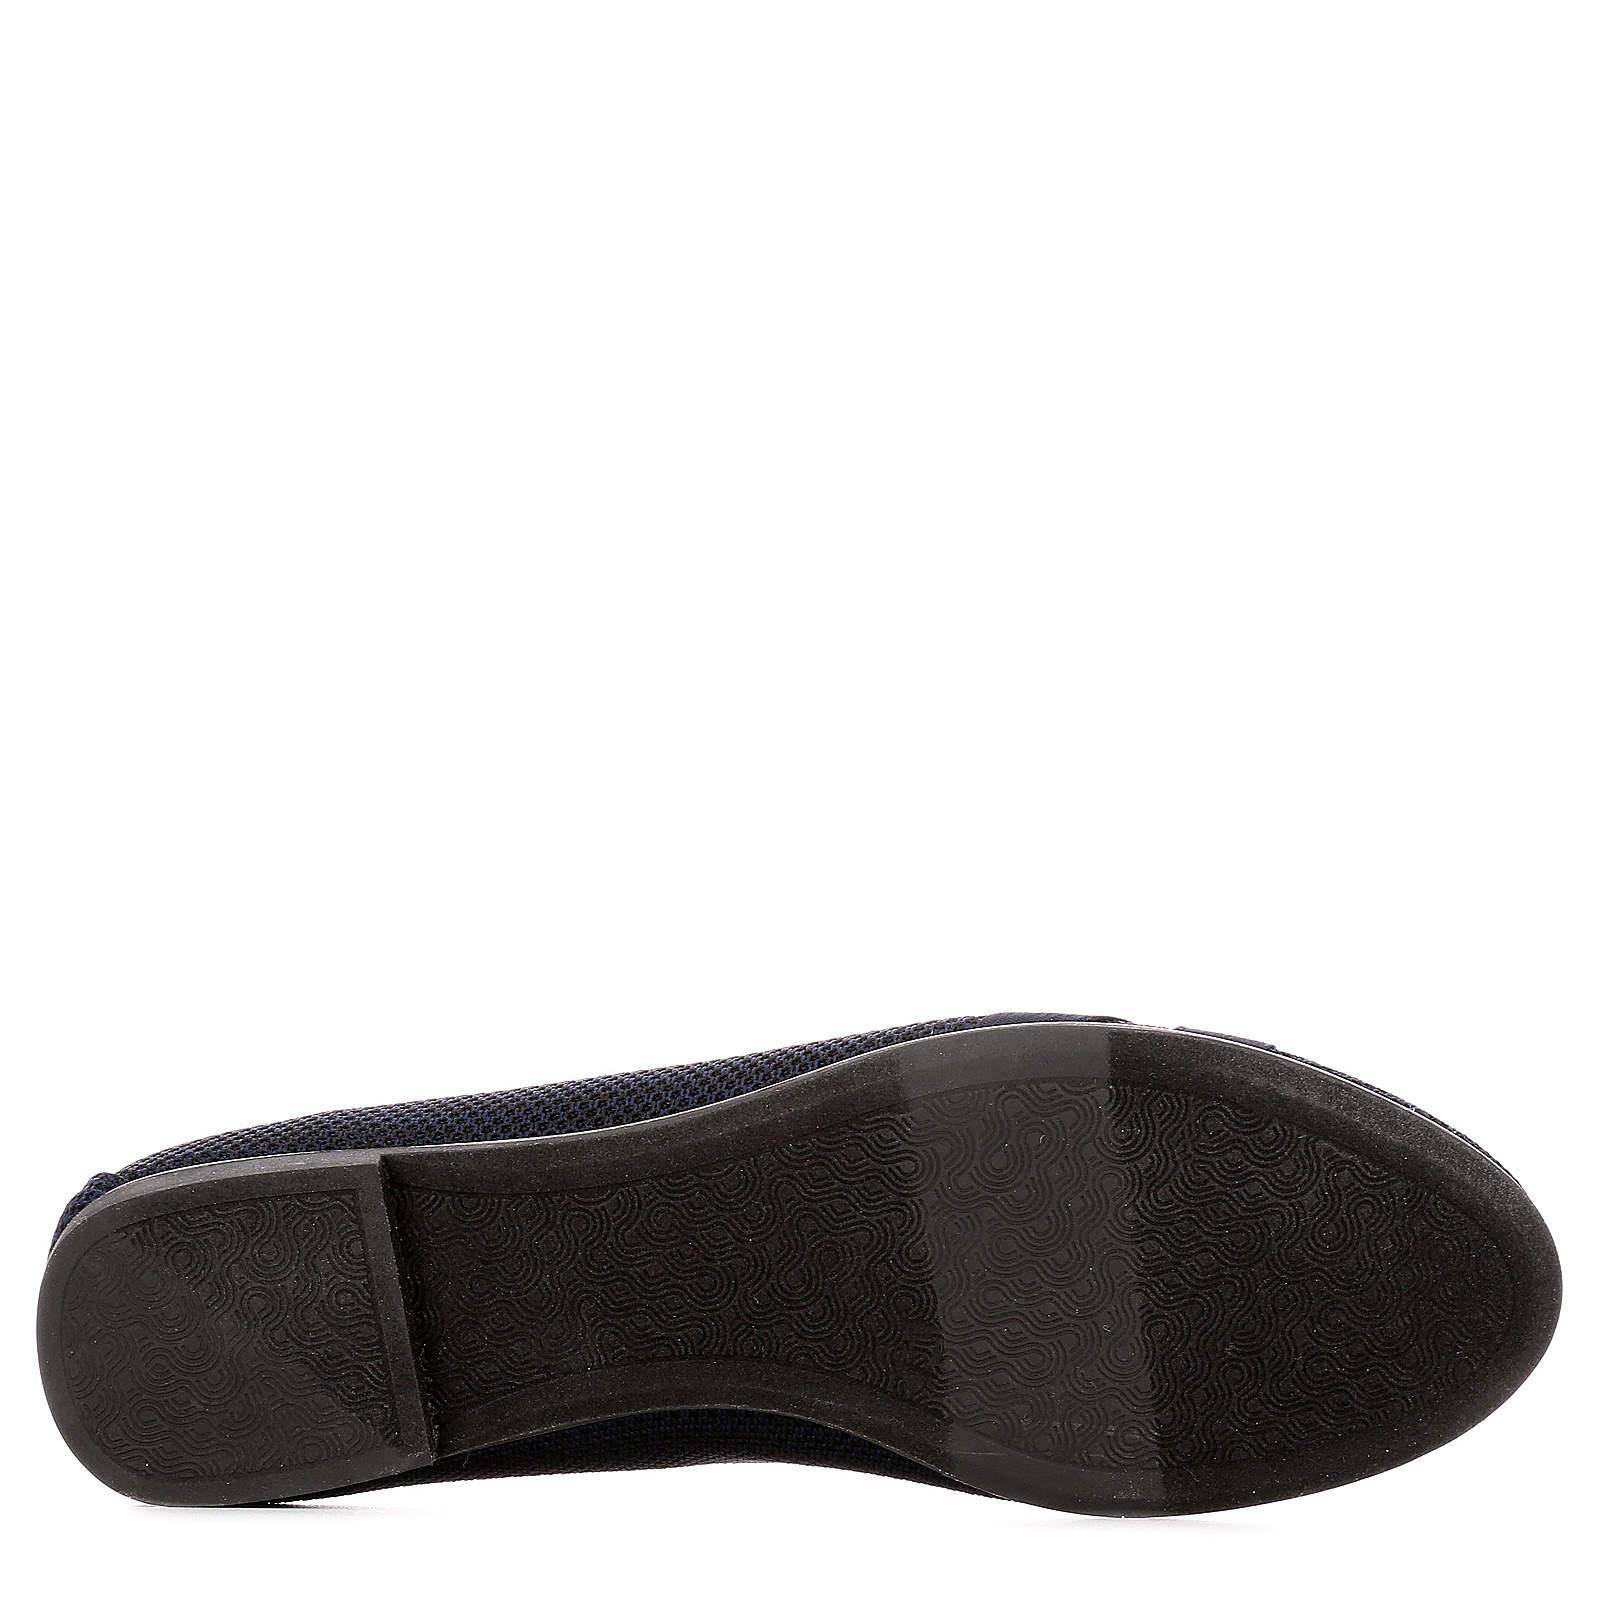 XAPPEAL-Womens-Mitzie-Slip-On-Mesh-Flat-Shoes thumbnail 8